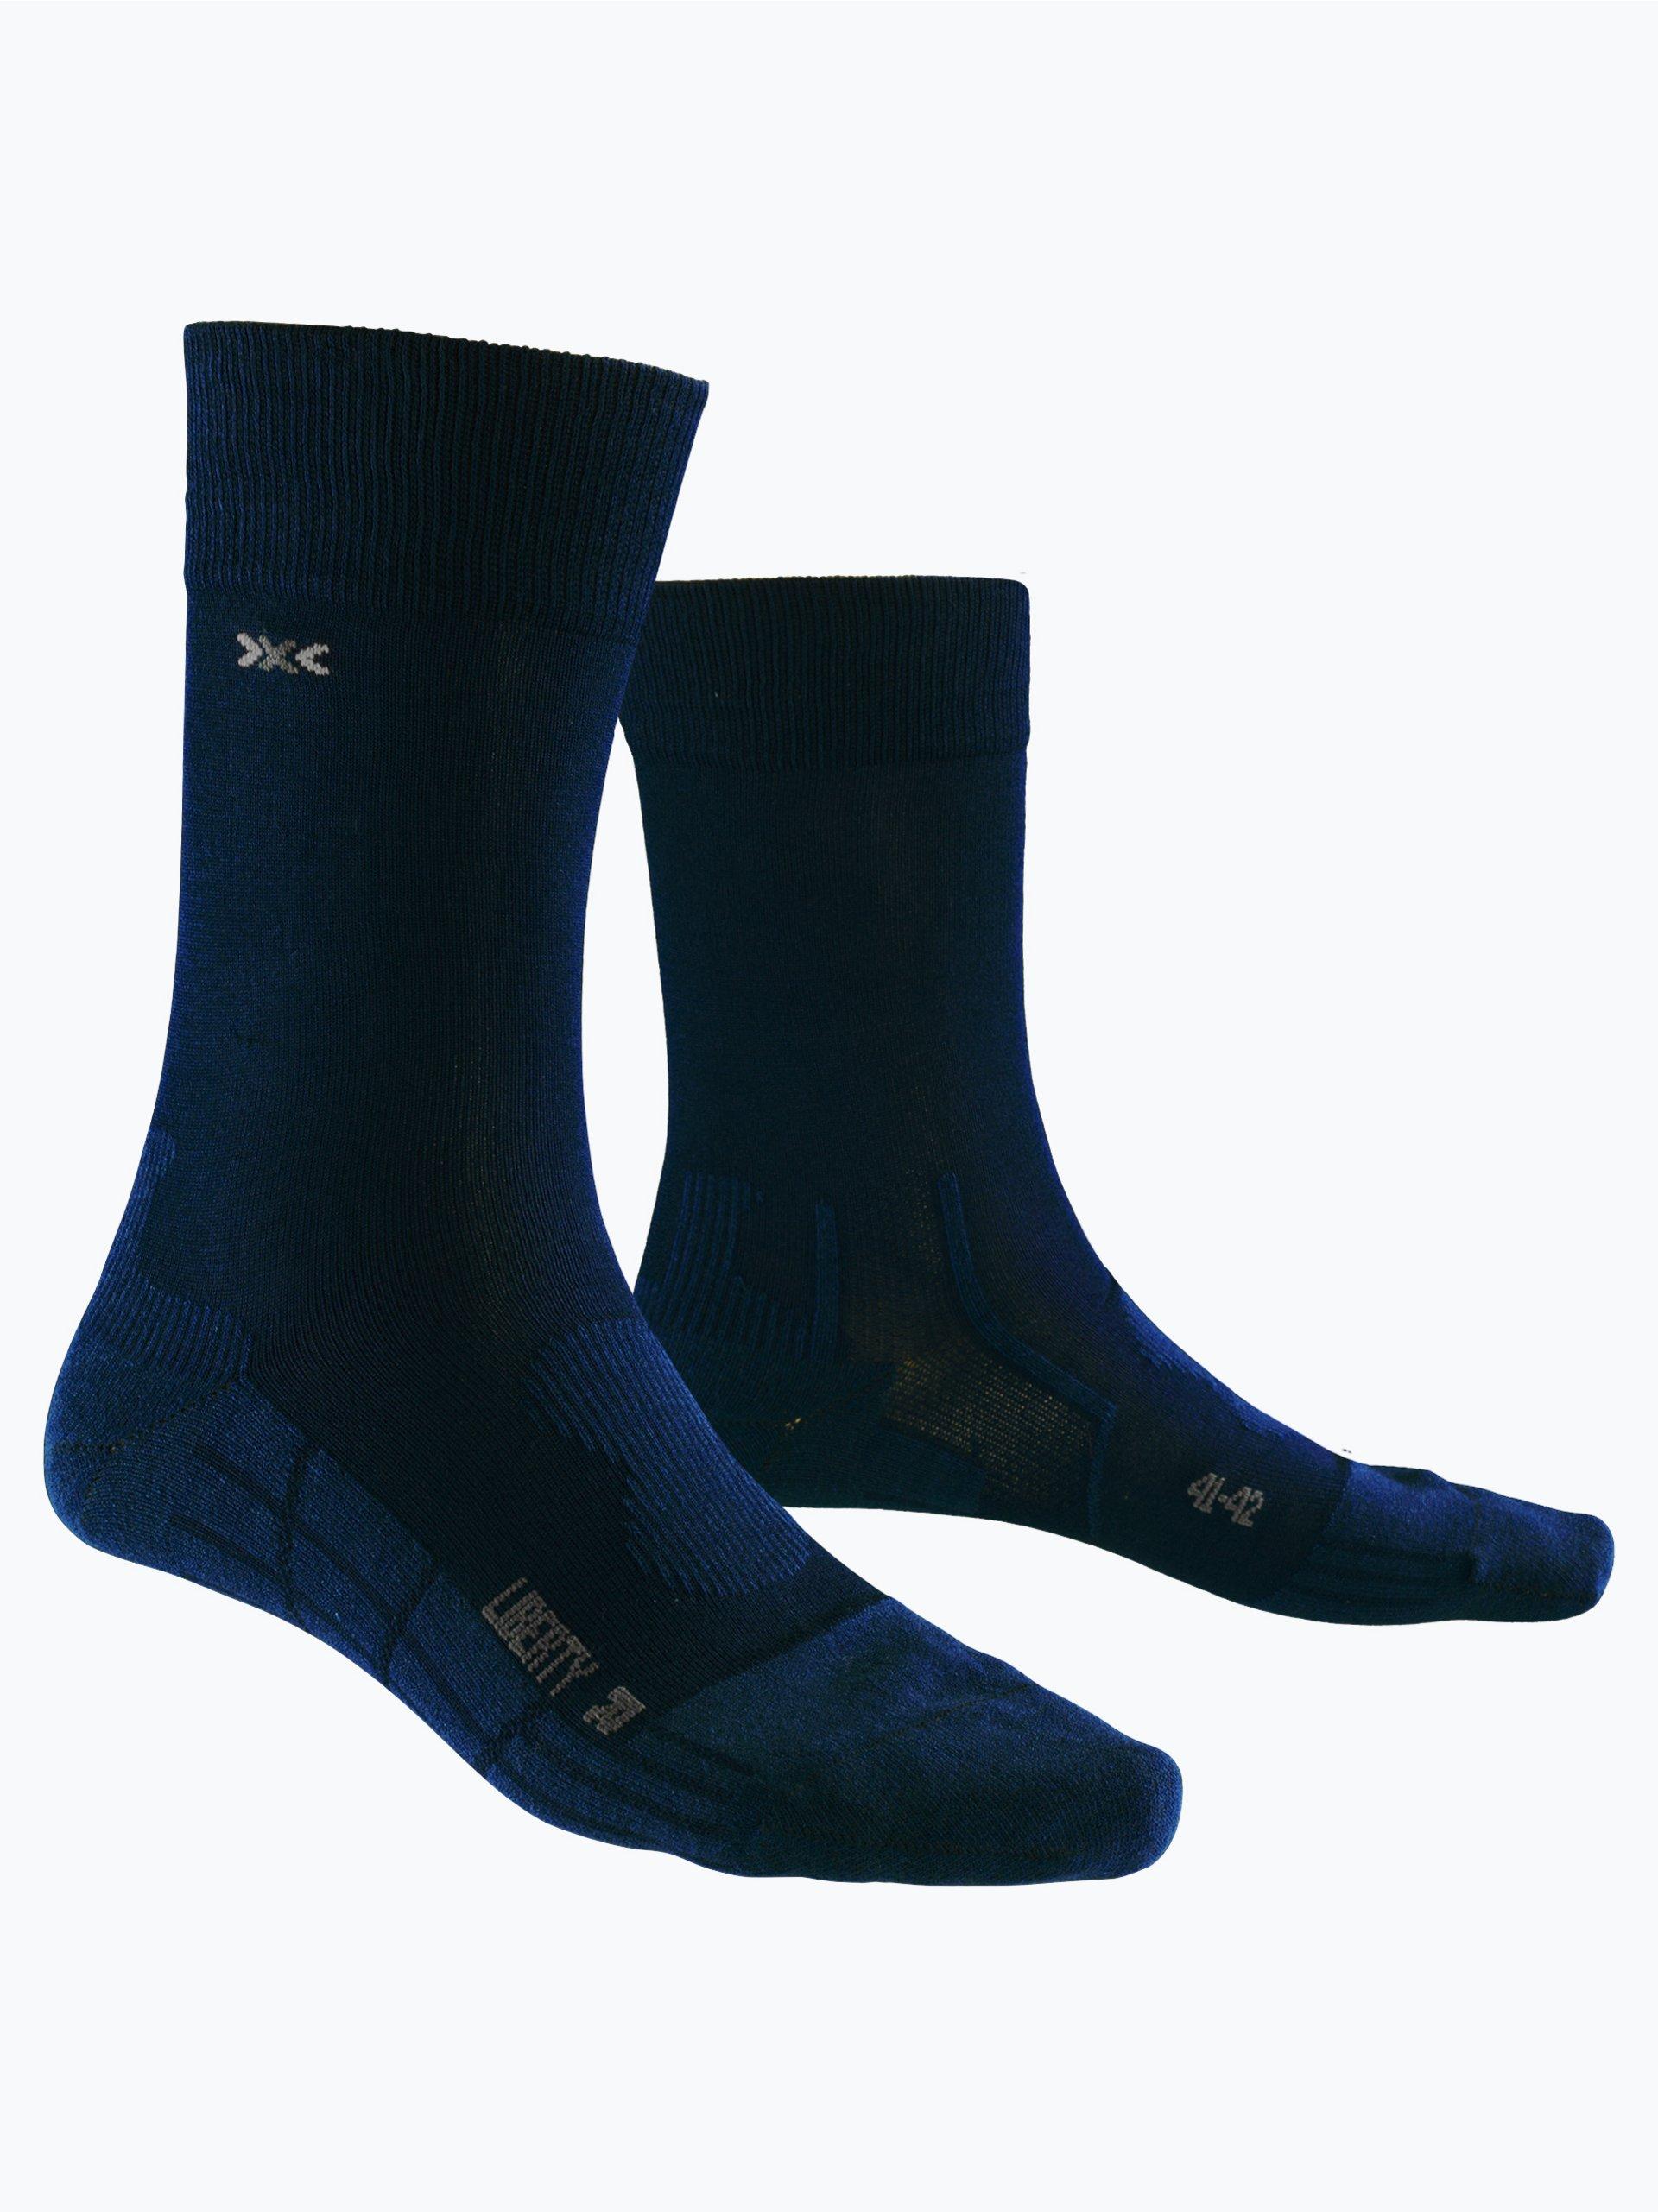 X-Socks Herren Socken - Liberty